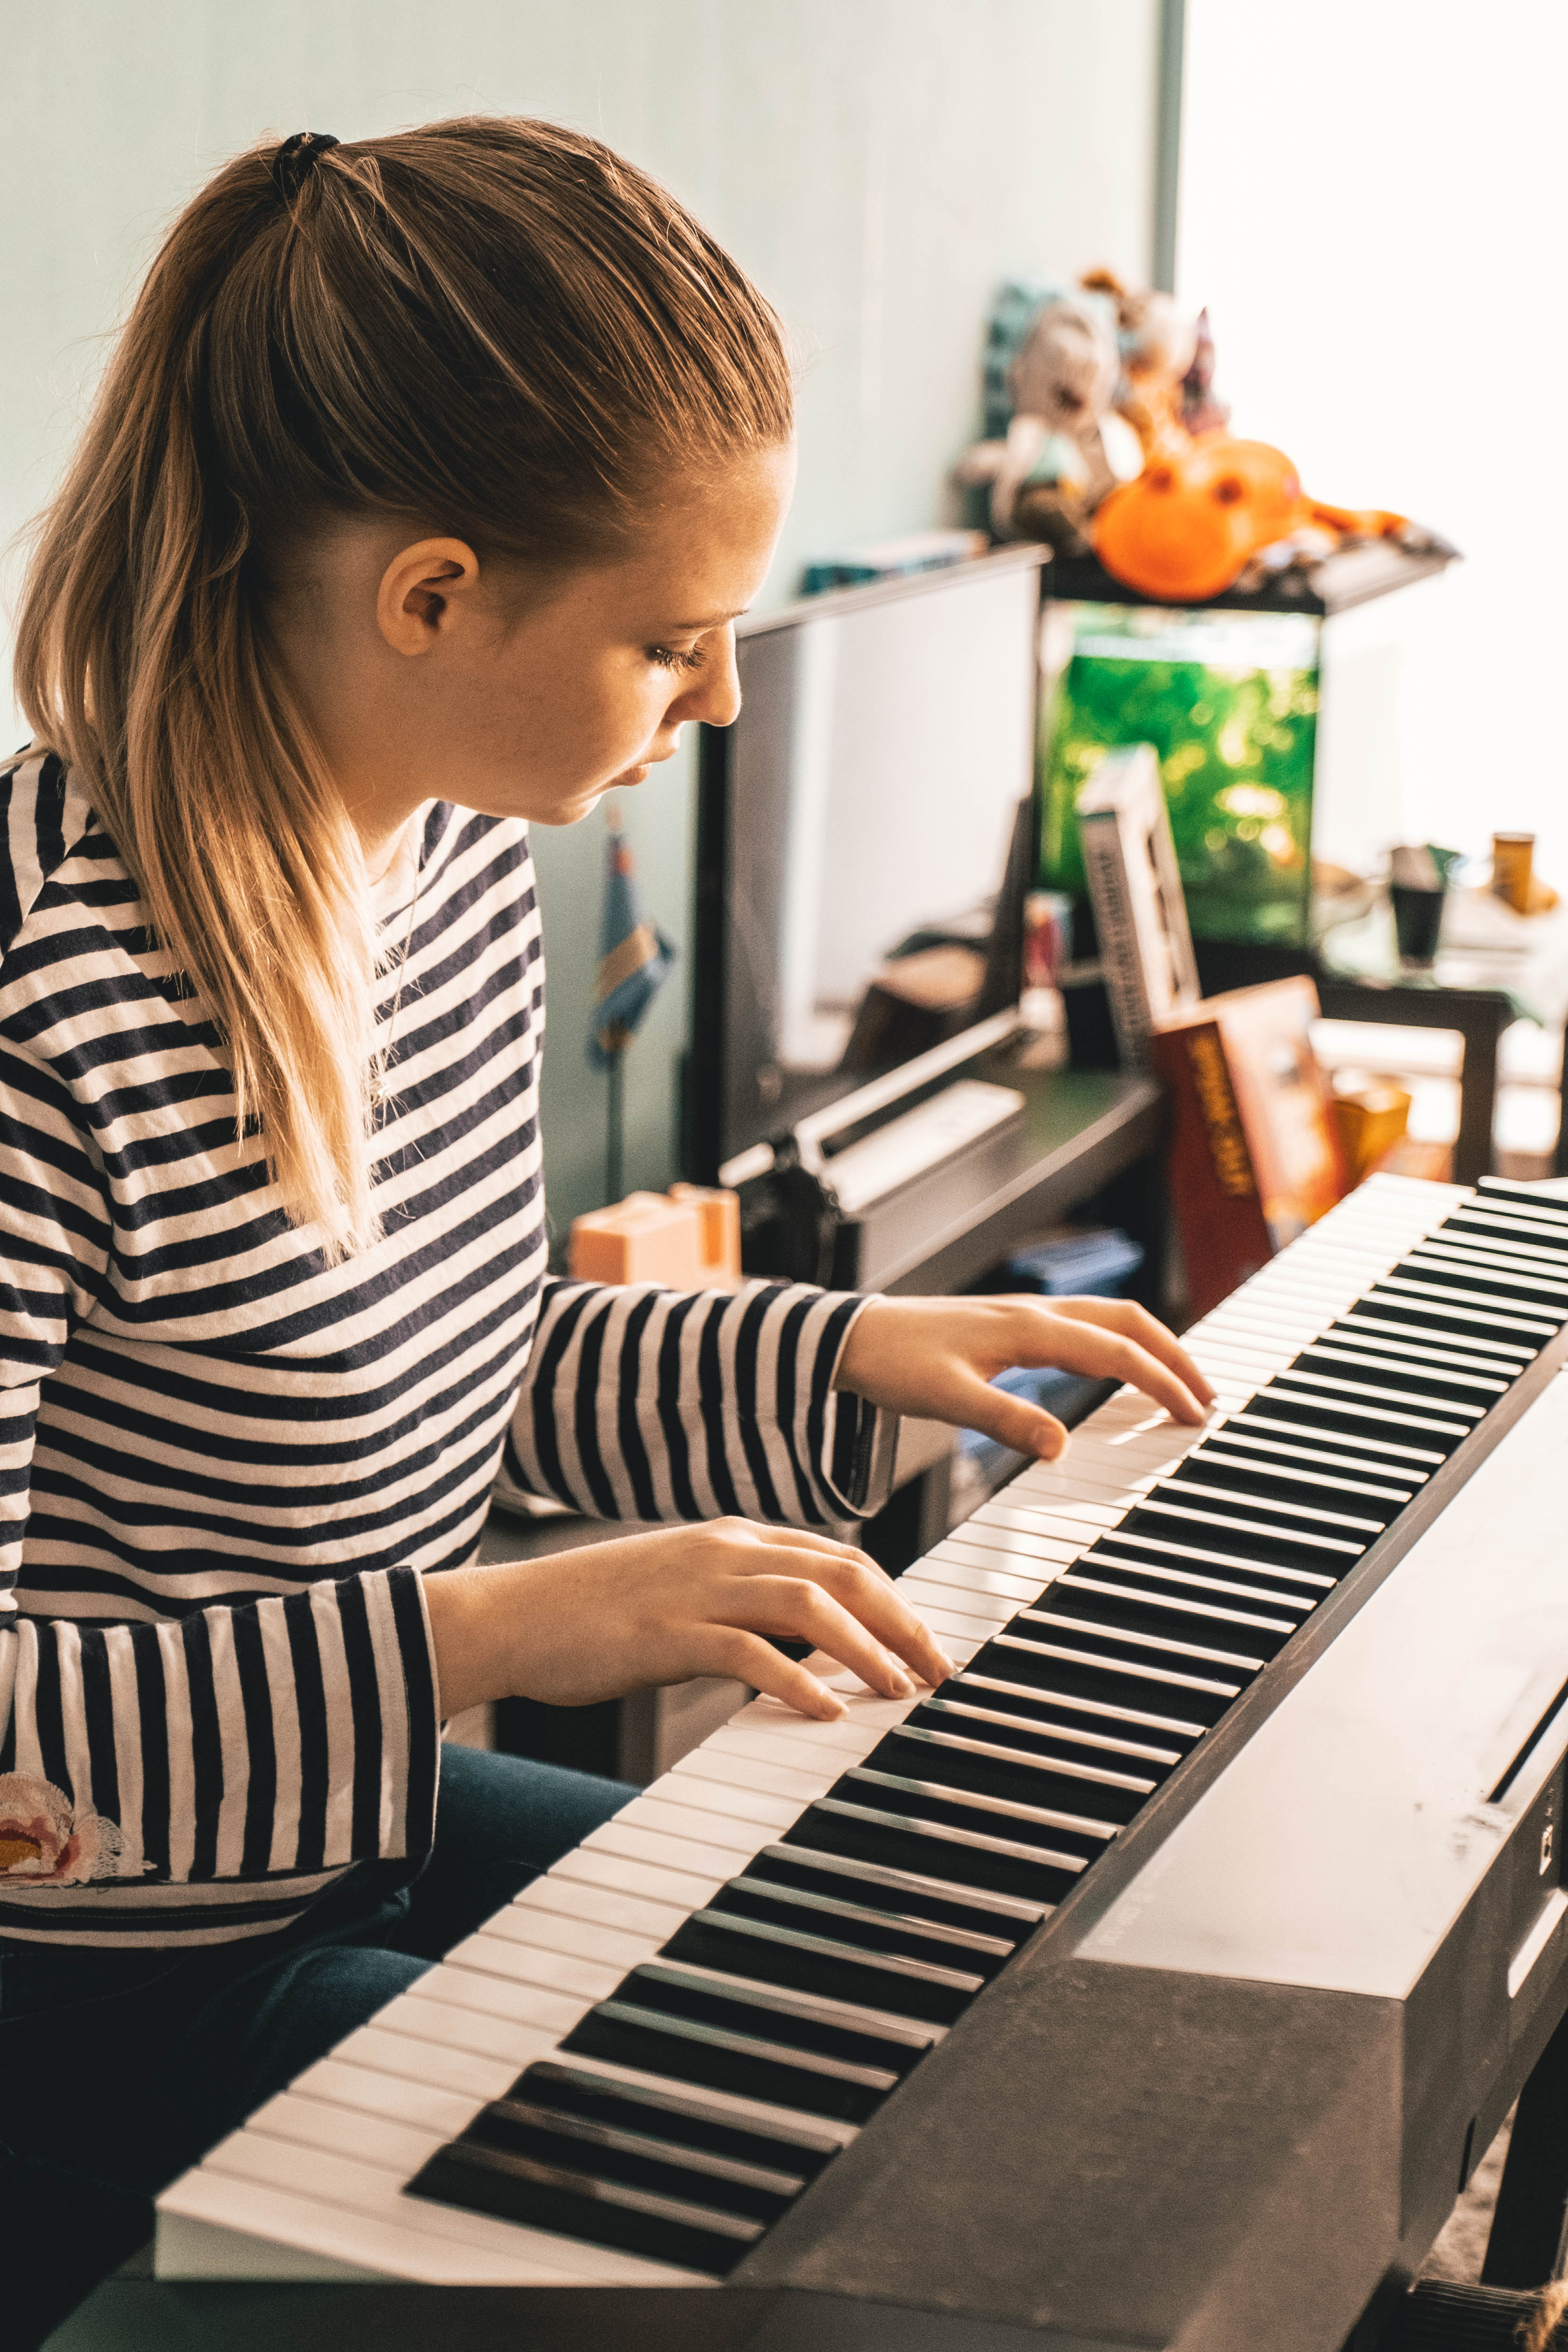 Photo Of Woman Playing Piano Free Stock Photo